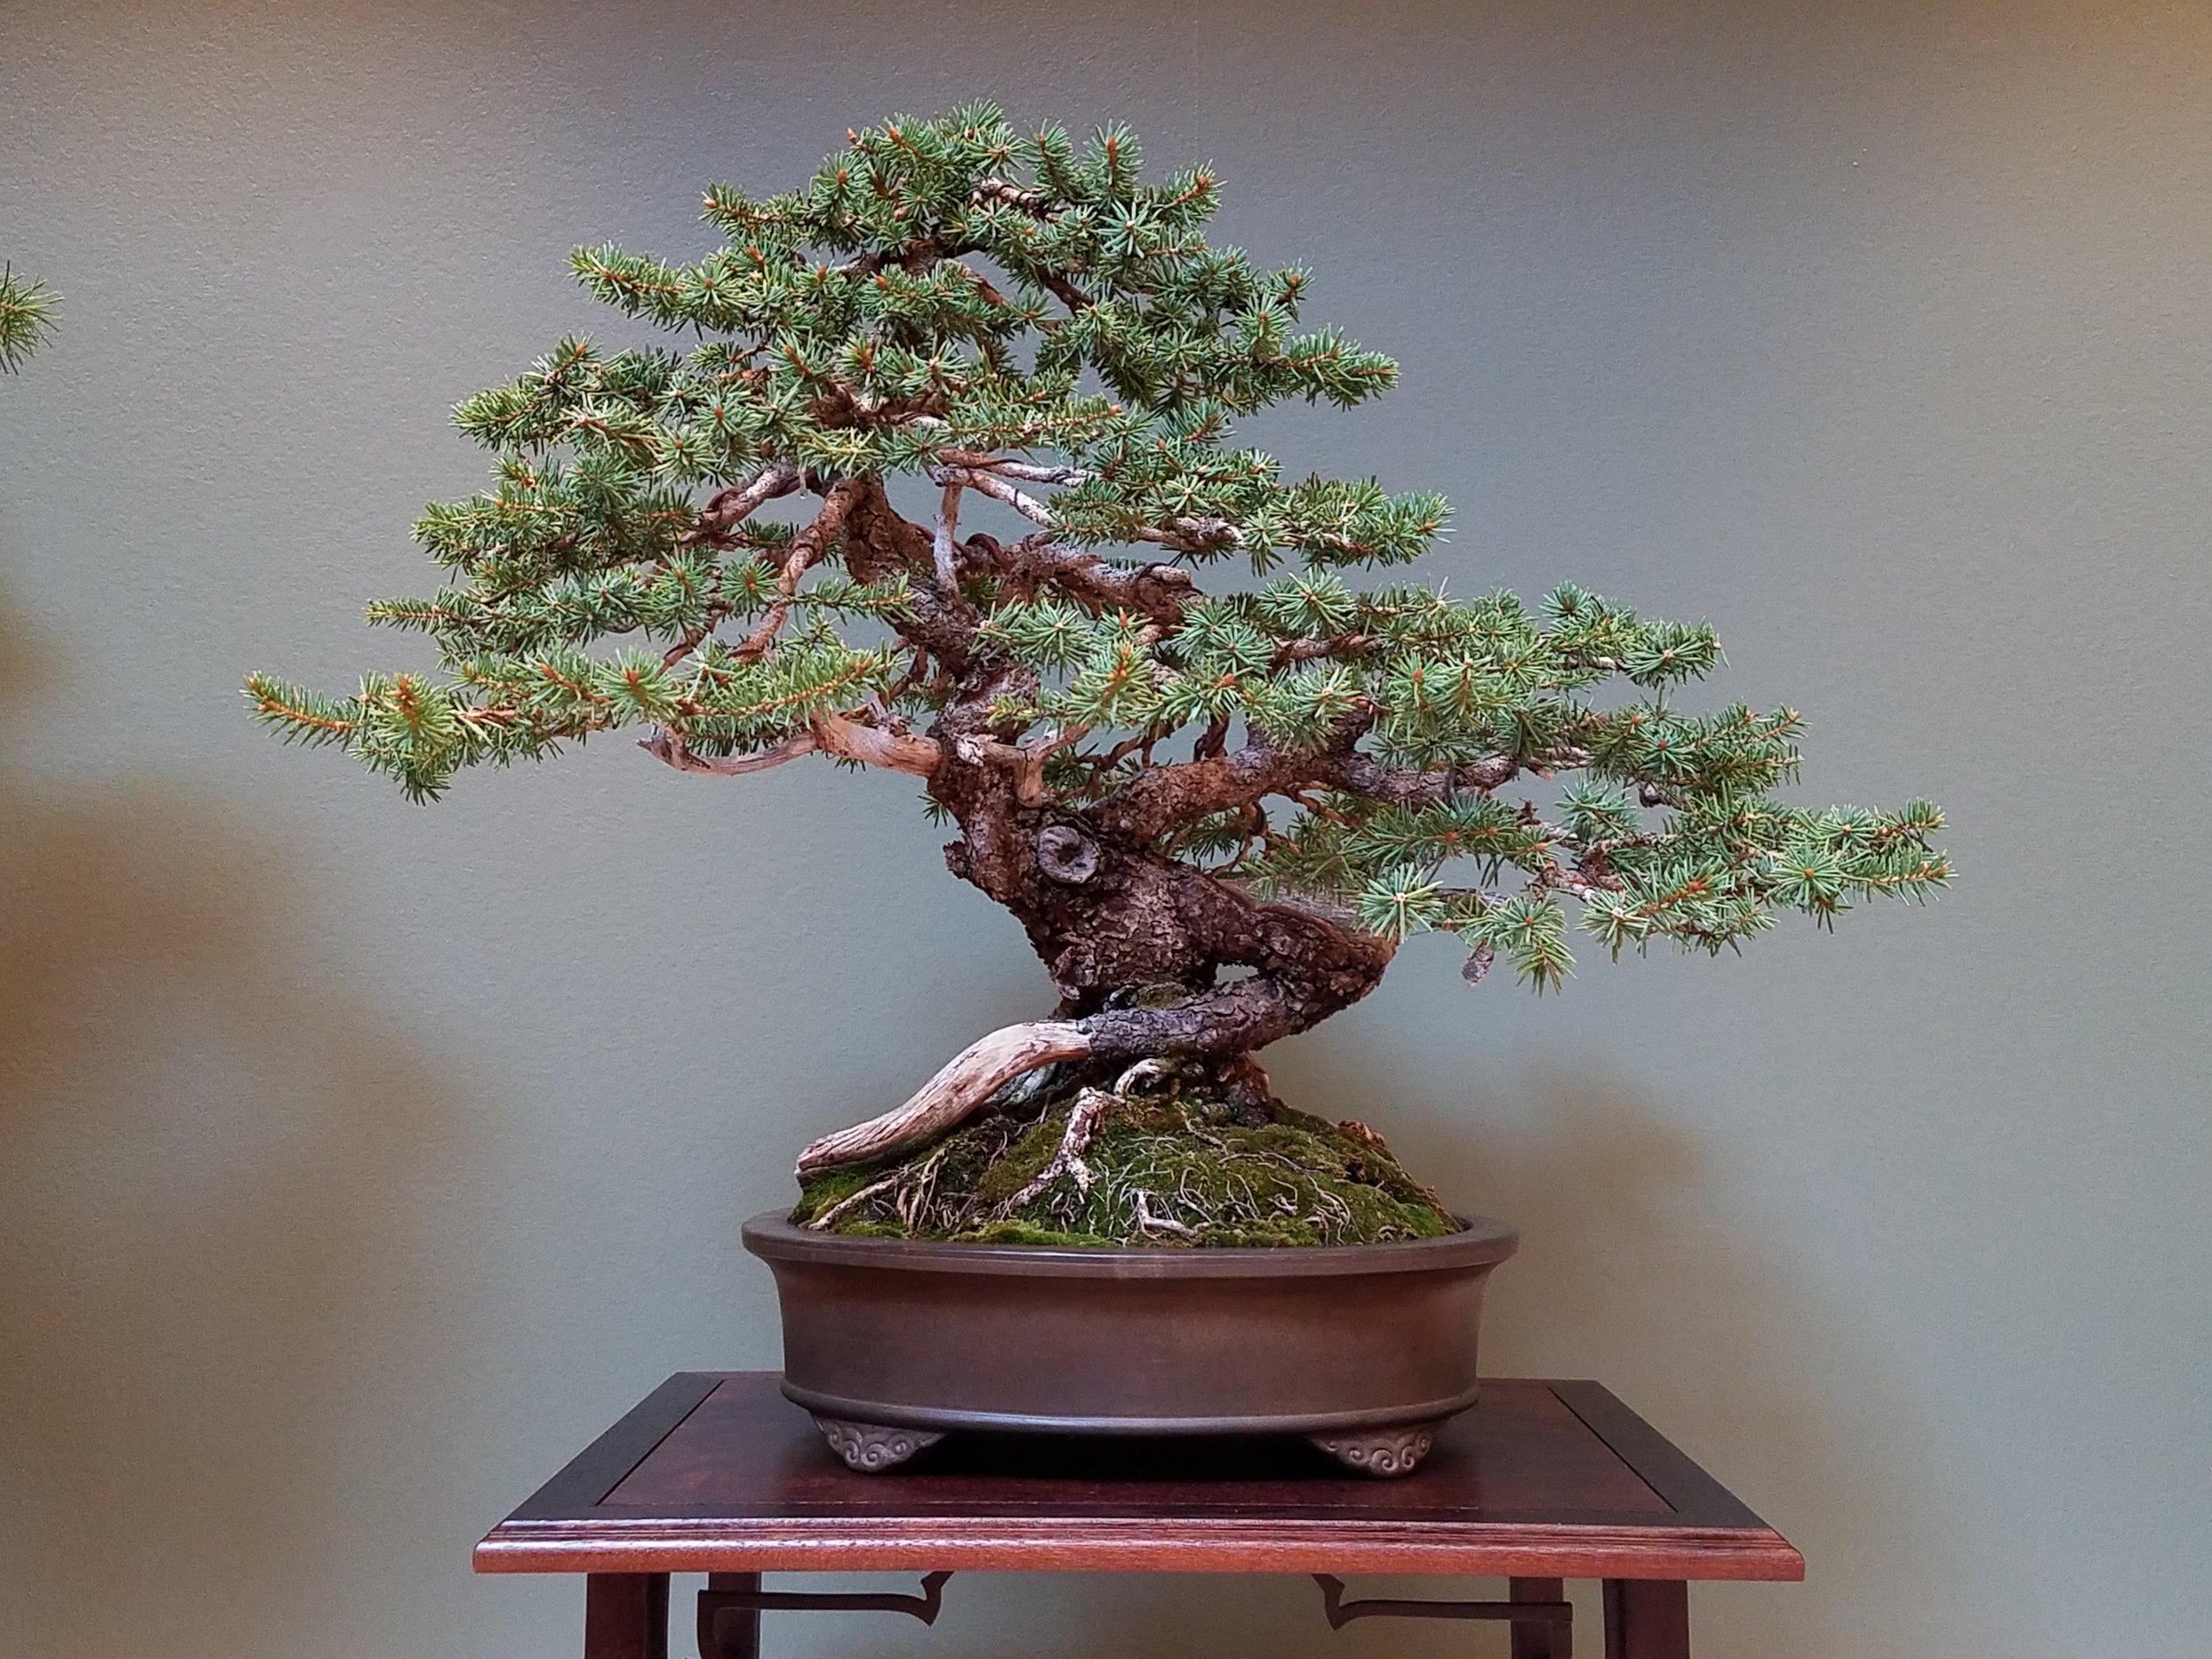 2017 Mid-America Bonsai Exhibition - Colorado Blue Spruce - Informal Upright